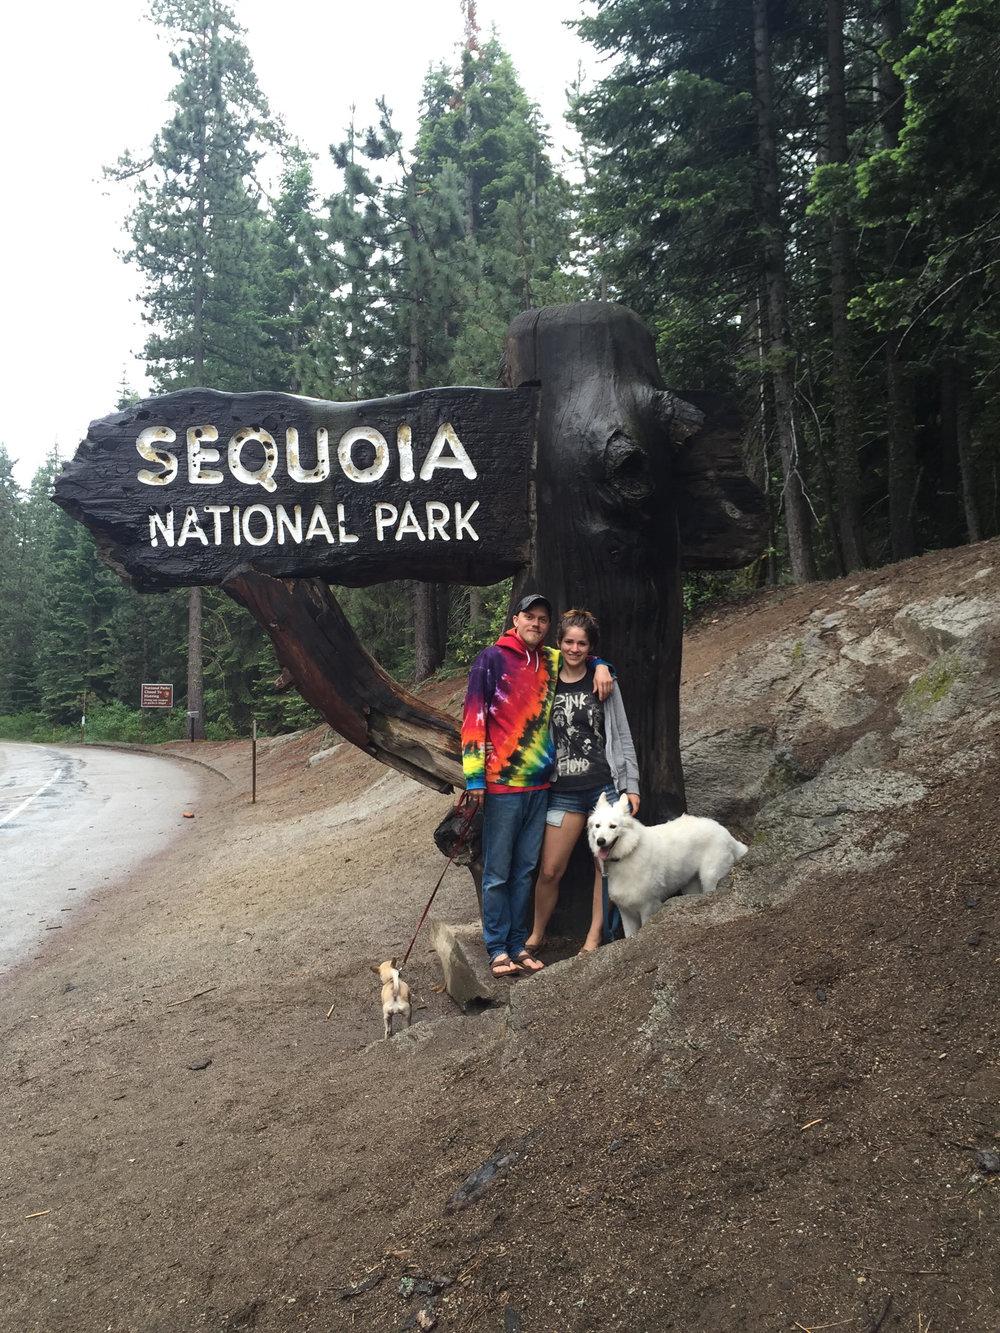 sequoia picture.jpg